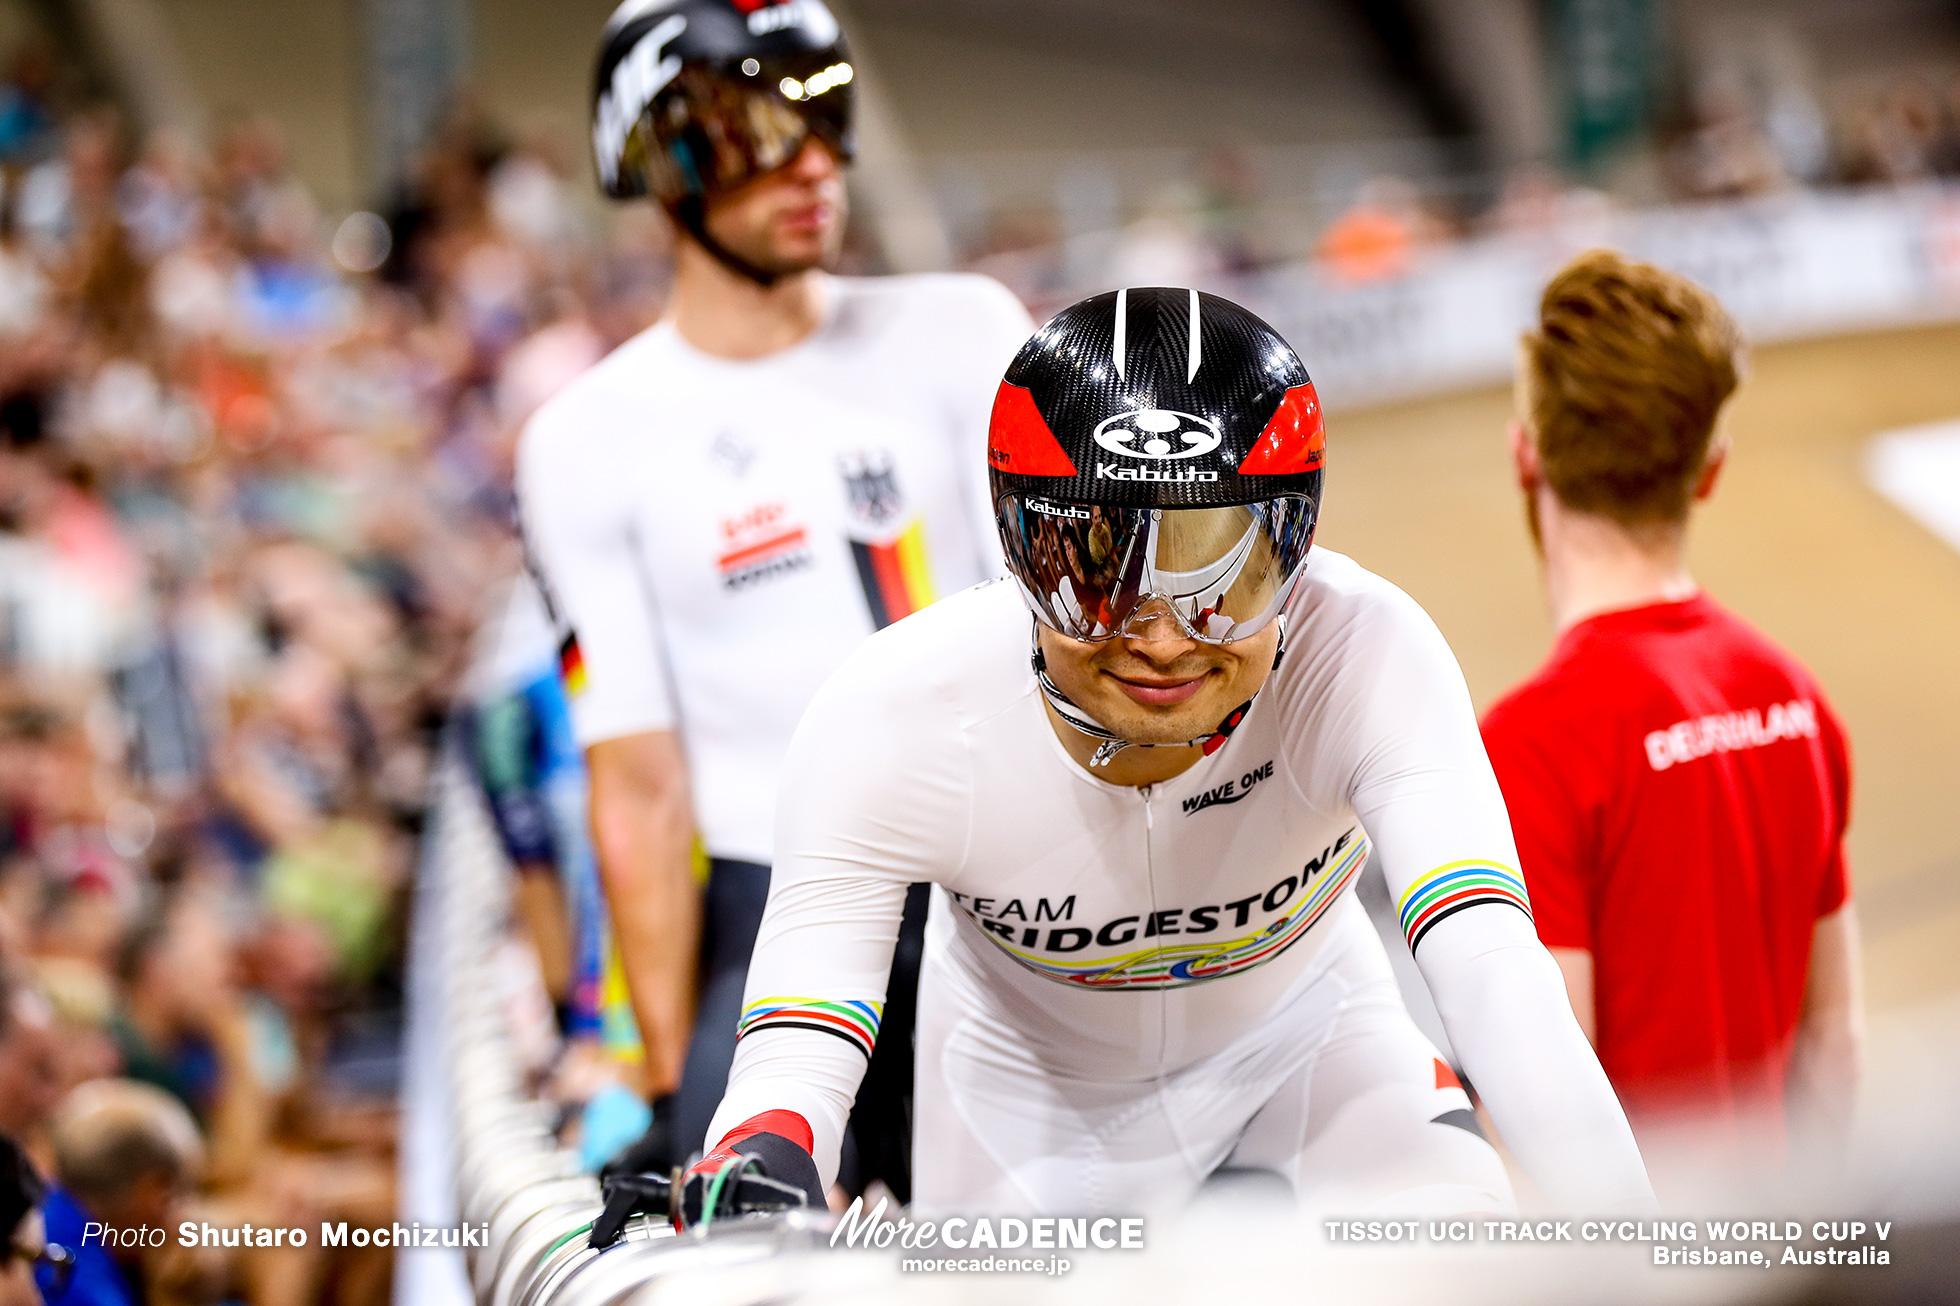 Men's Omnium / Tempo Race / TISSOT UCI TRACK CYCLING WORLD CUP V, Brisbane, Australia, 橋本英也